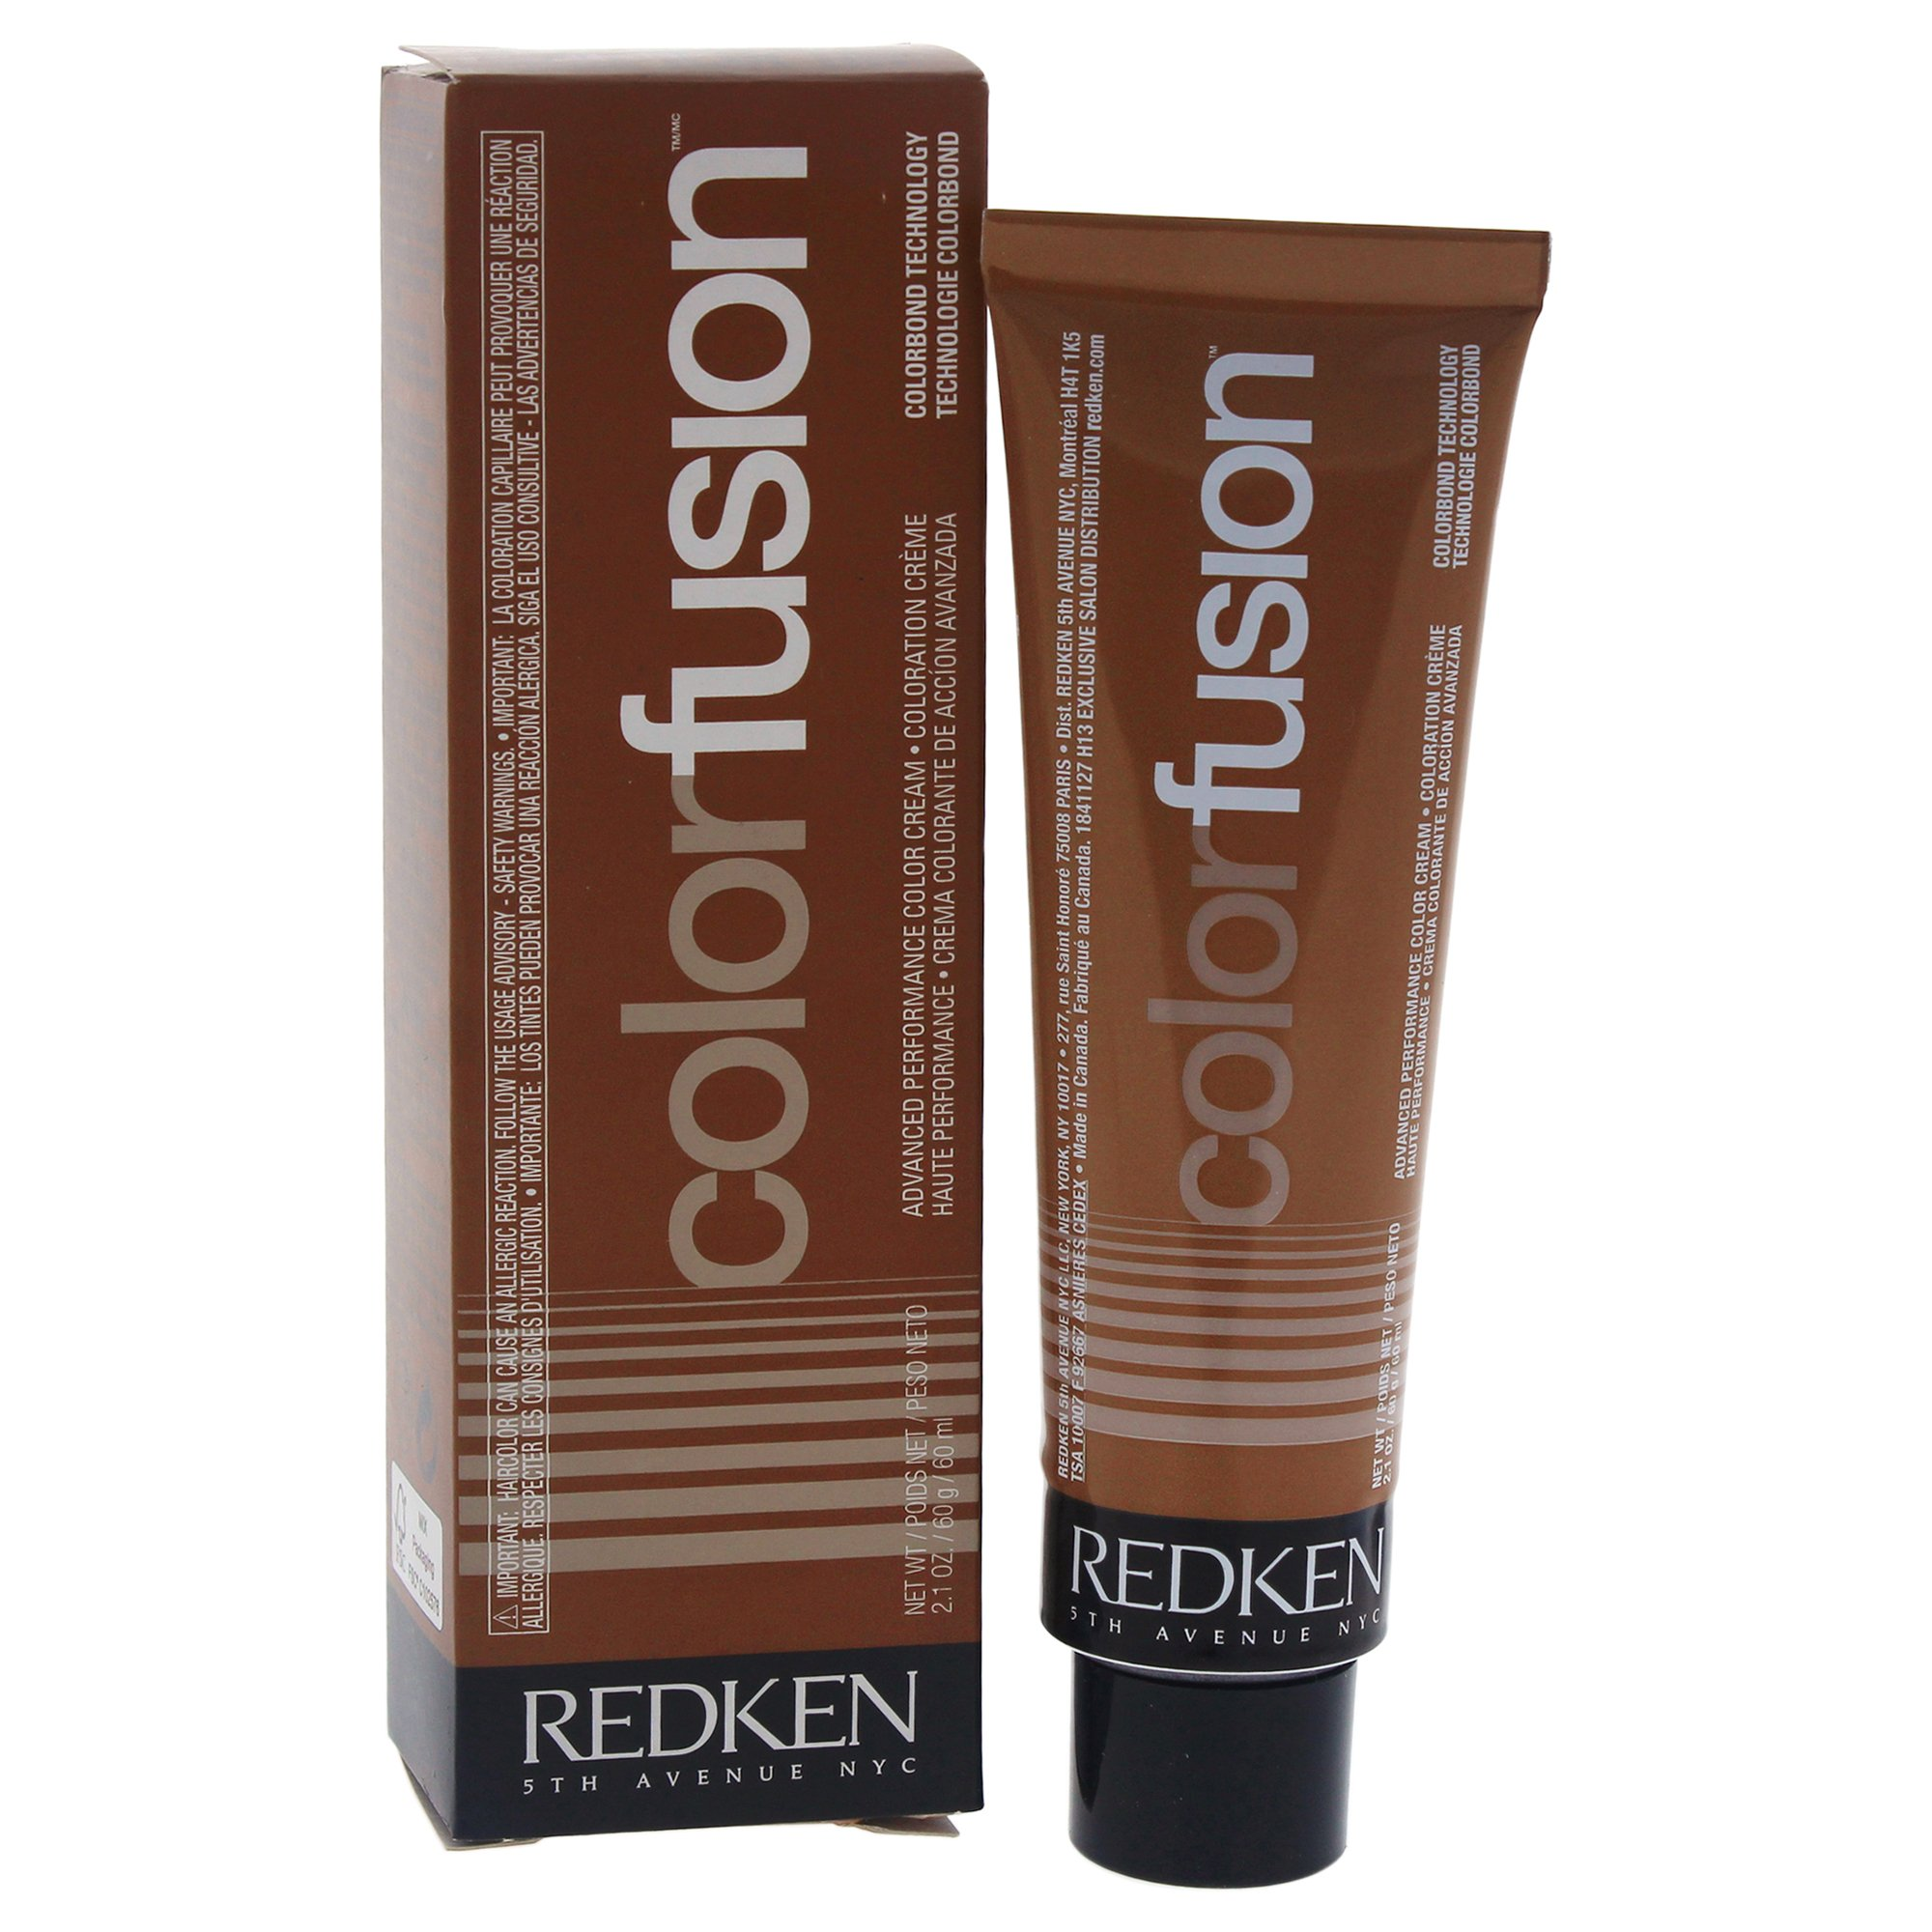 Cheap Redken Haircolor Find Redken Haircolor Deals On Line At